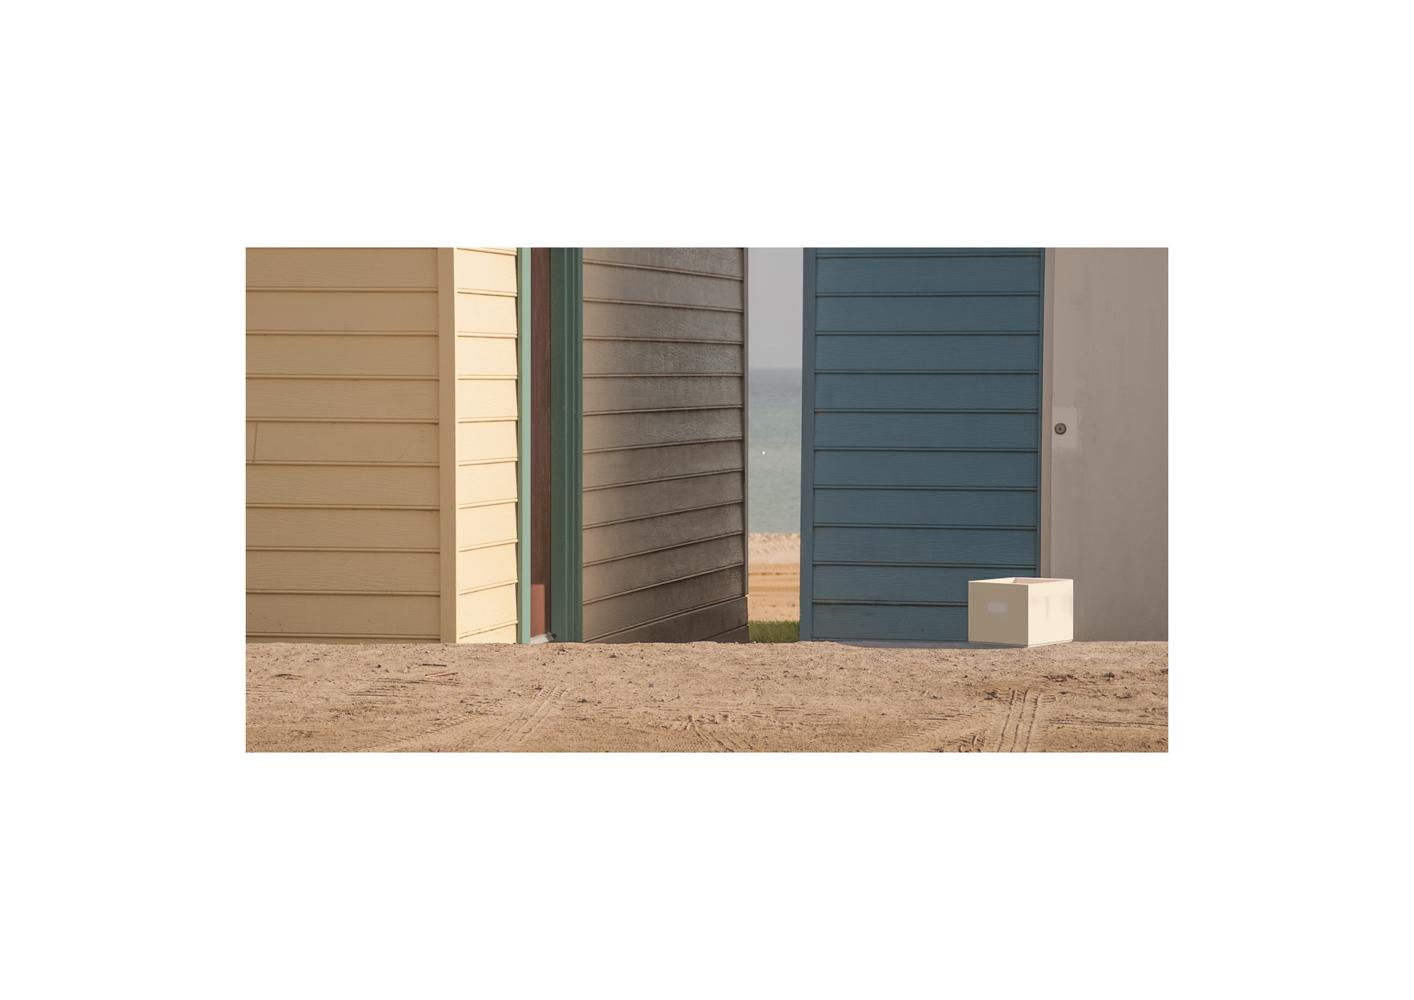 Beach study 7. 2020, archival pigment print, 15 x 27 cm